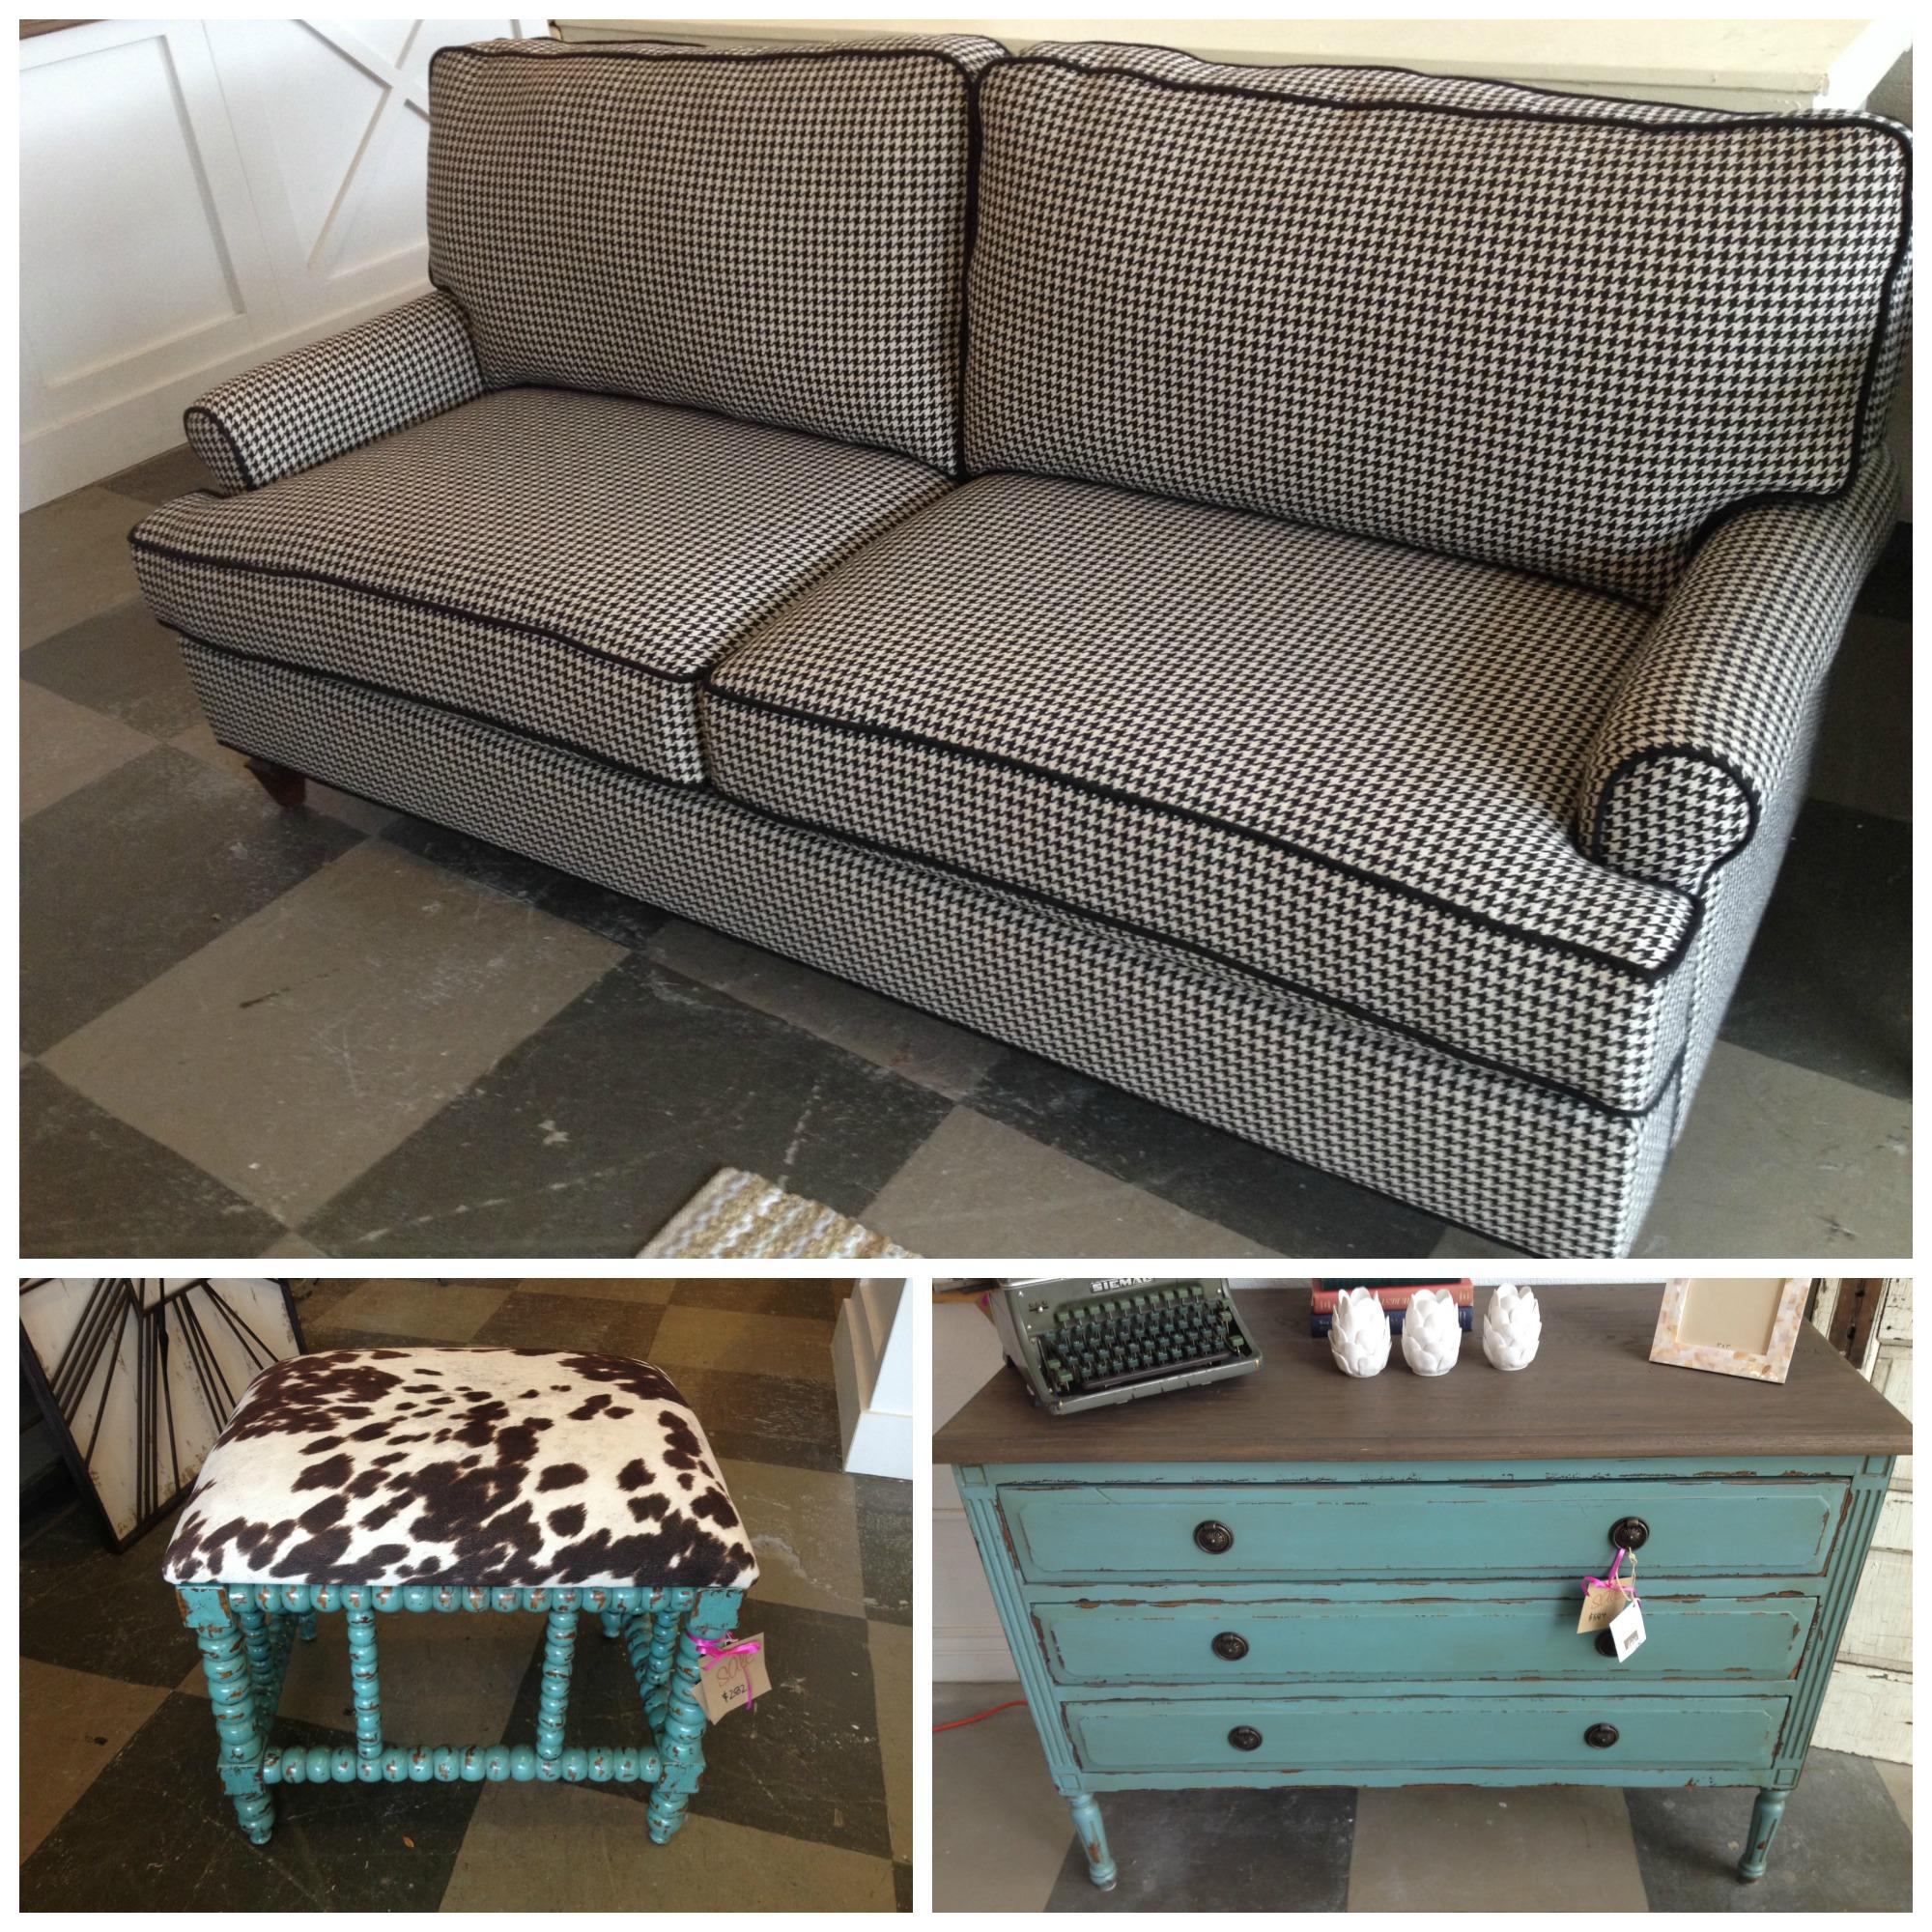 Top: Townsend Sofa // Reg. $1927 //  SALE: $1446   Bottom Left: Chahna Small Bench // Reg. $375 //  SALE: $282   Bottom Right: Paris Dresser // Reg. $865 //  SALE: $584